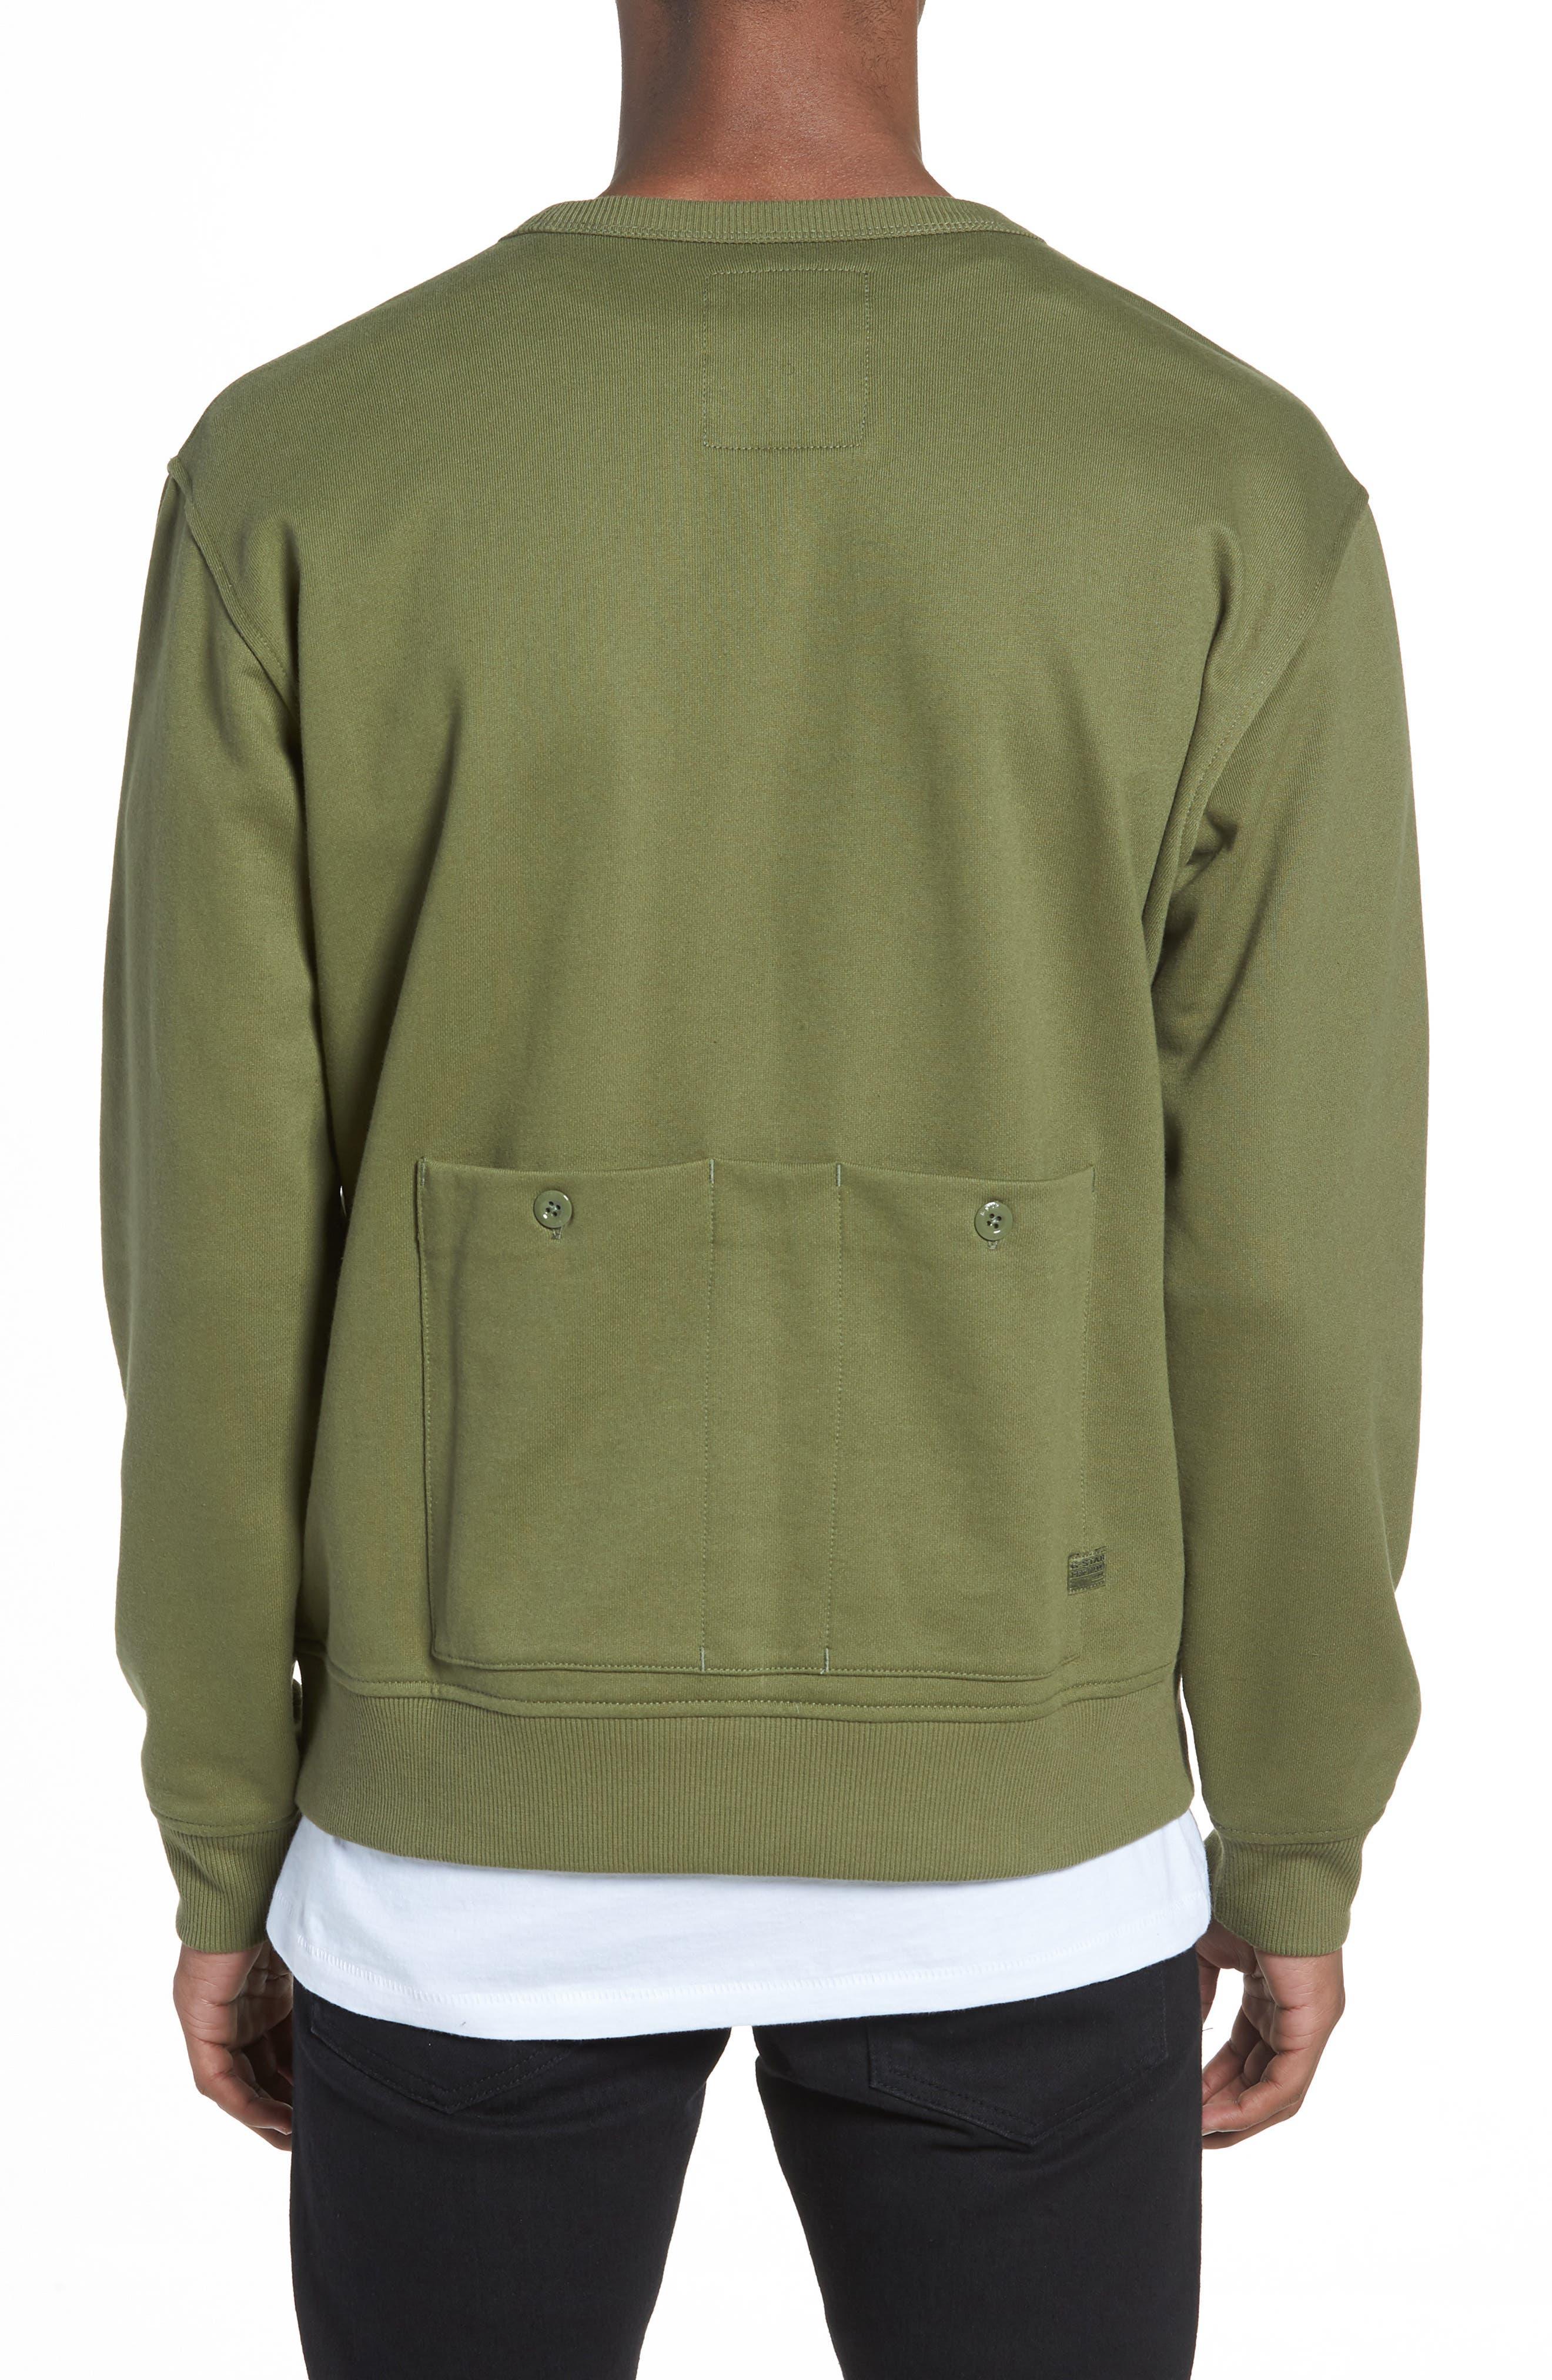 Core Hybrid Archive Sweatshirt,                             Alternate thumbnail 2, color,                             300